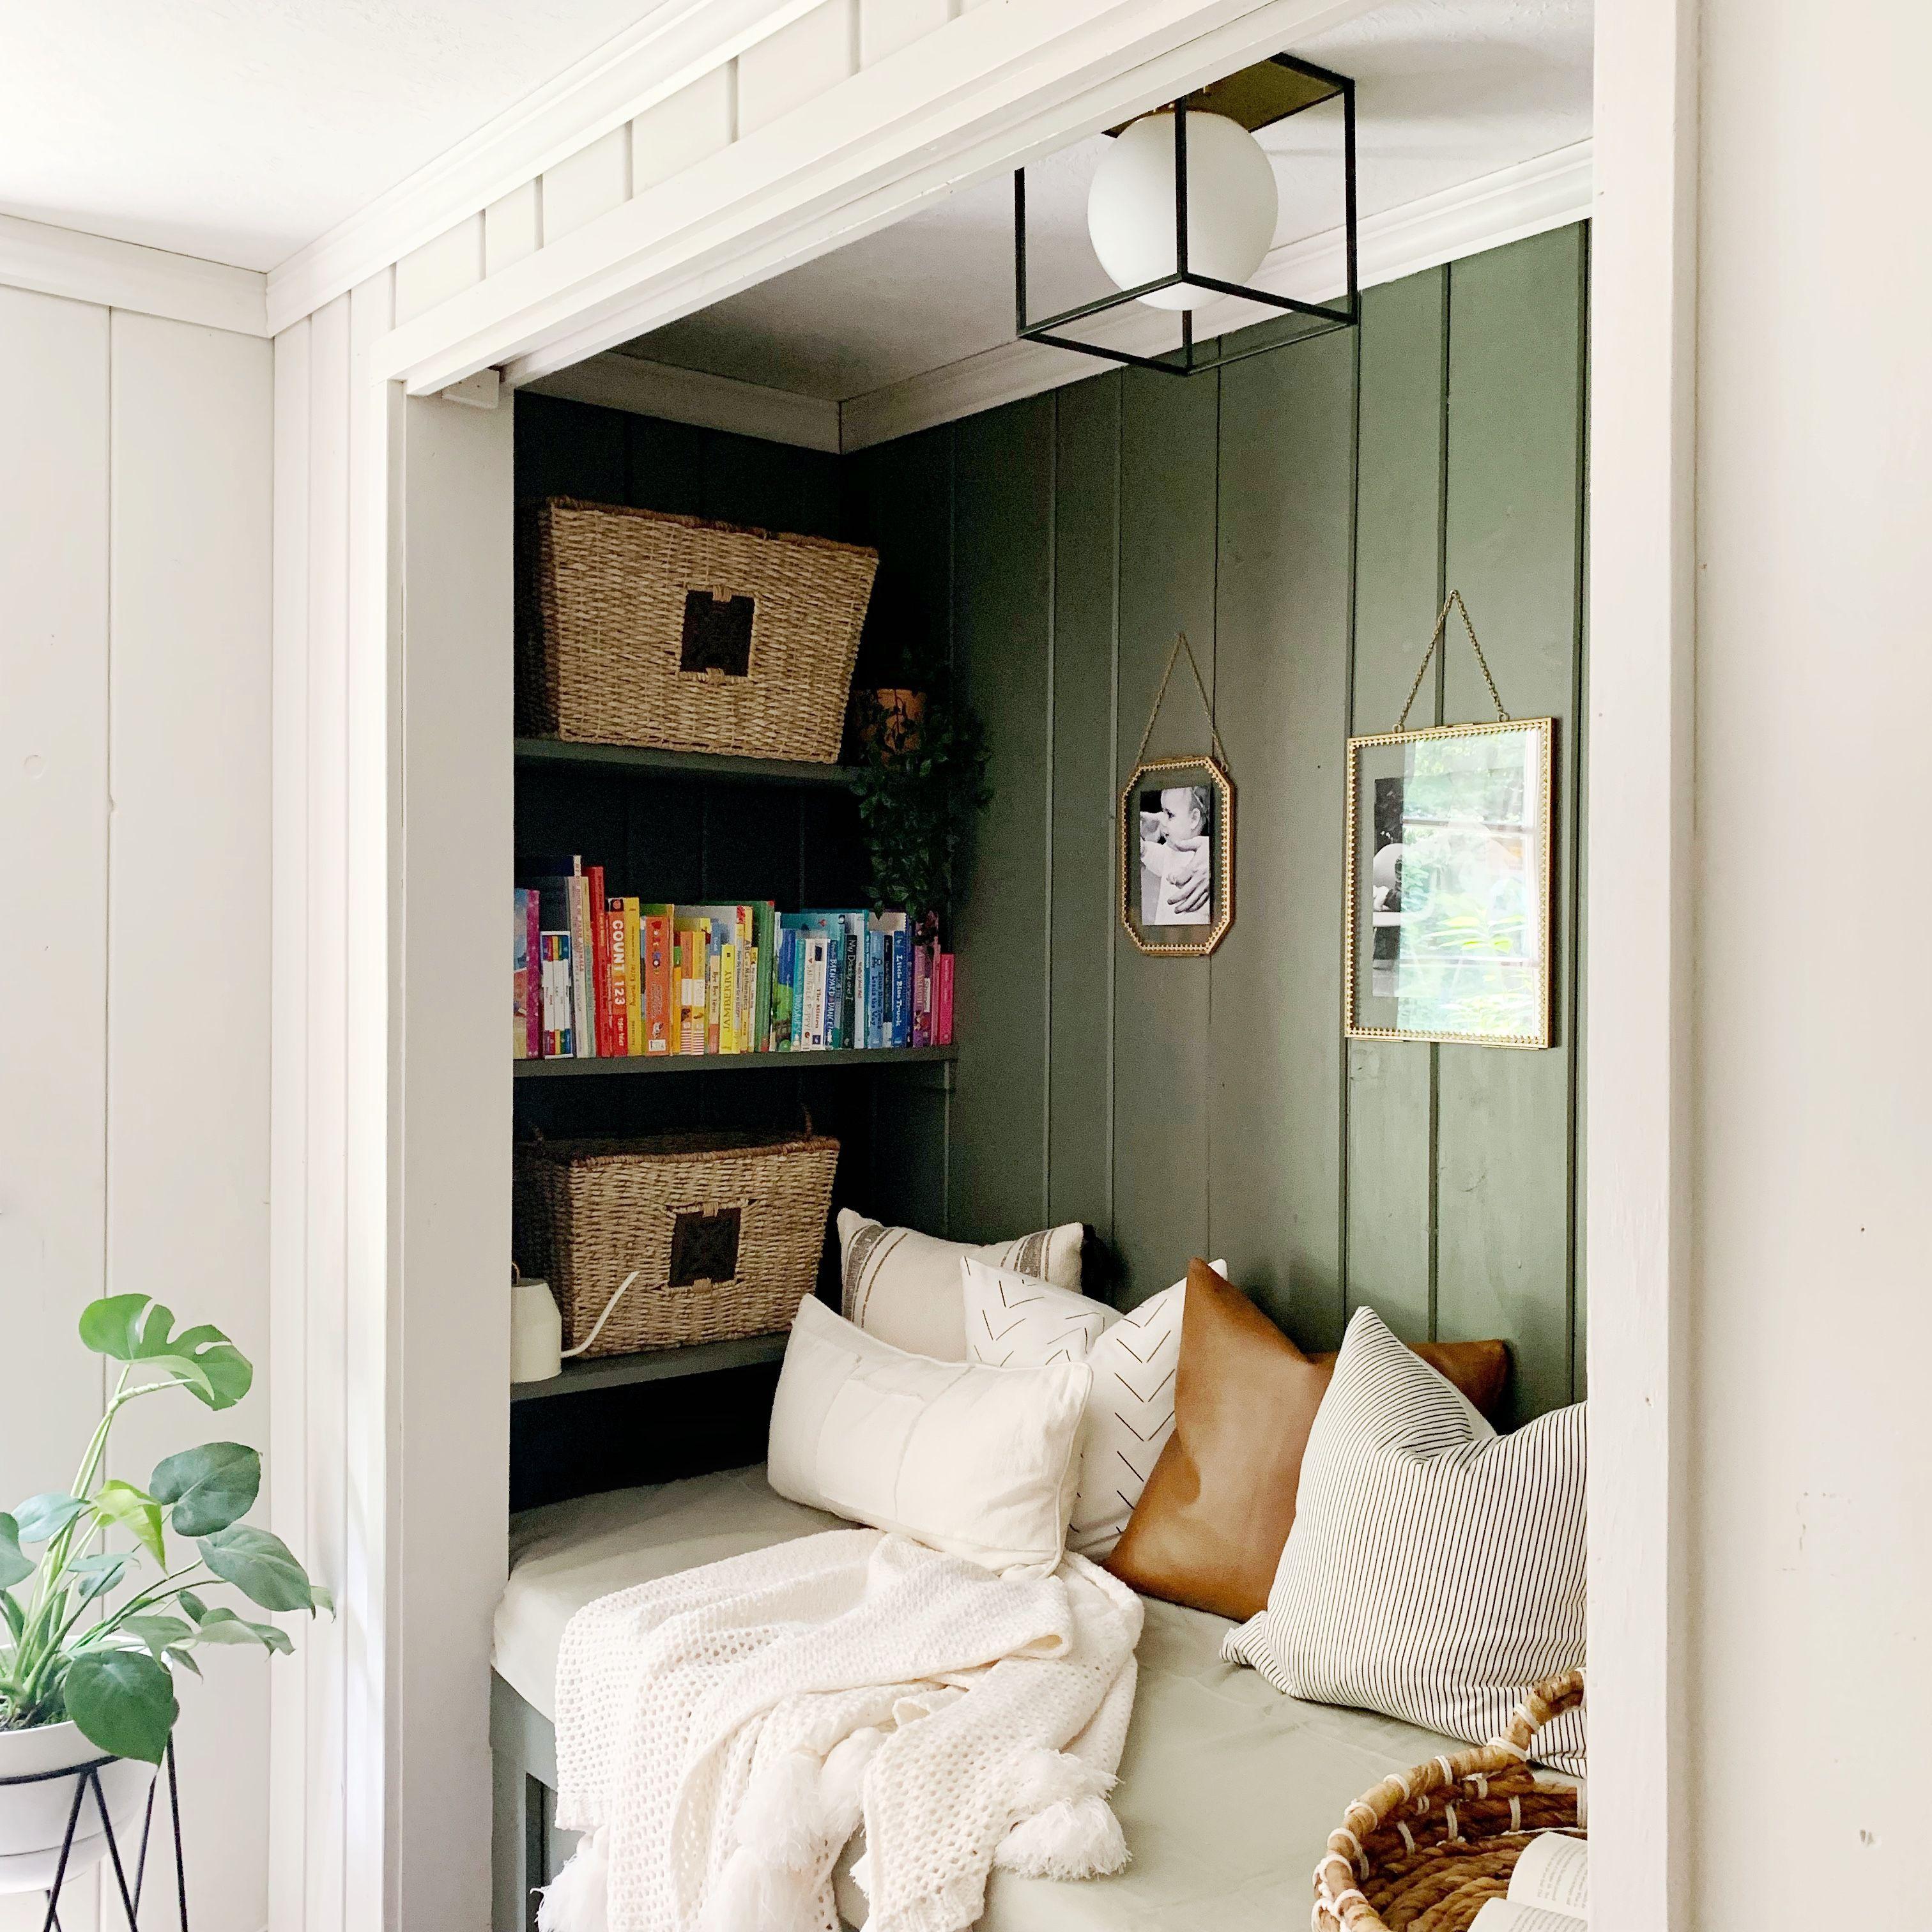 DIY a Cozy Book Nook - Style + Dwell